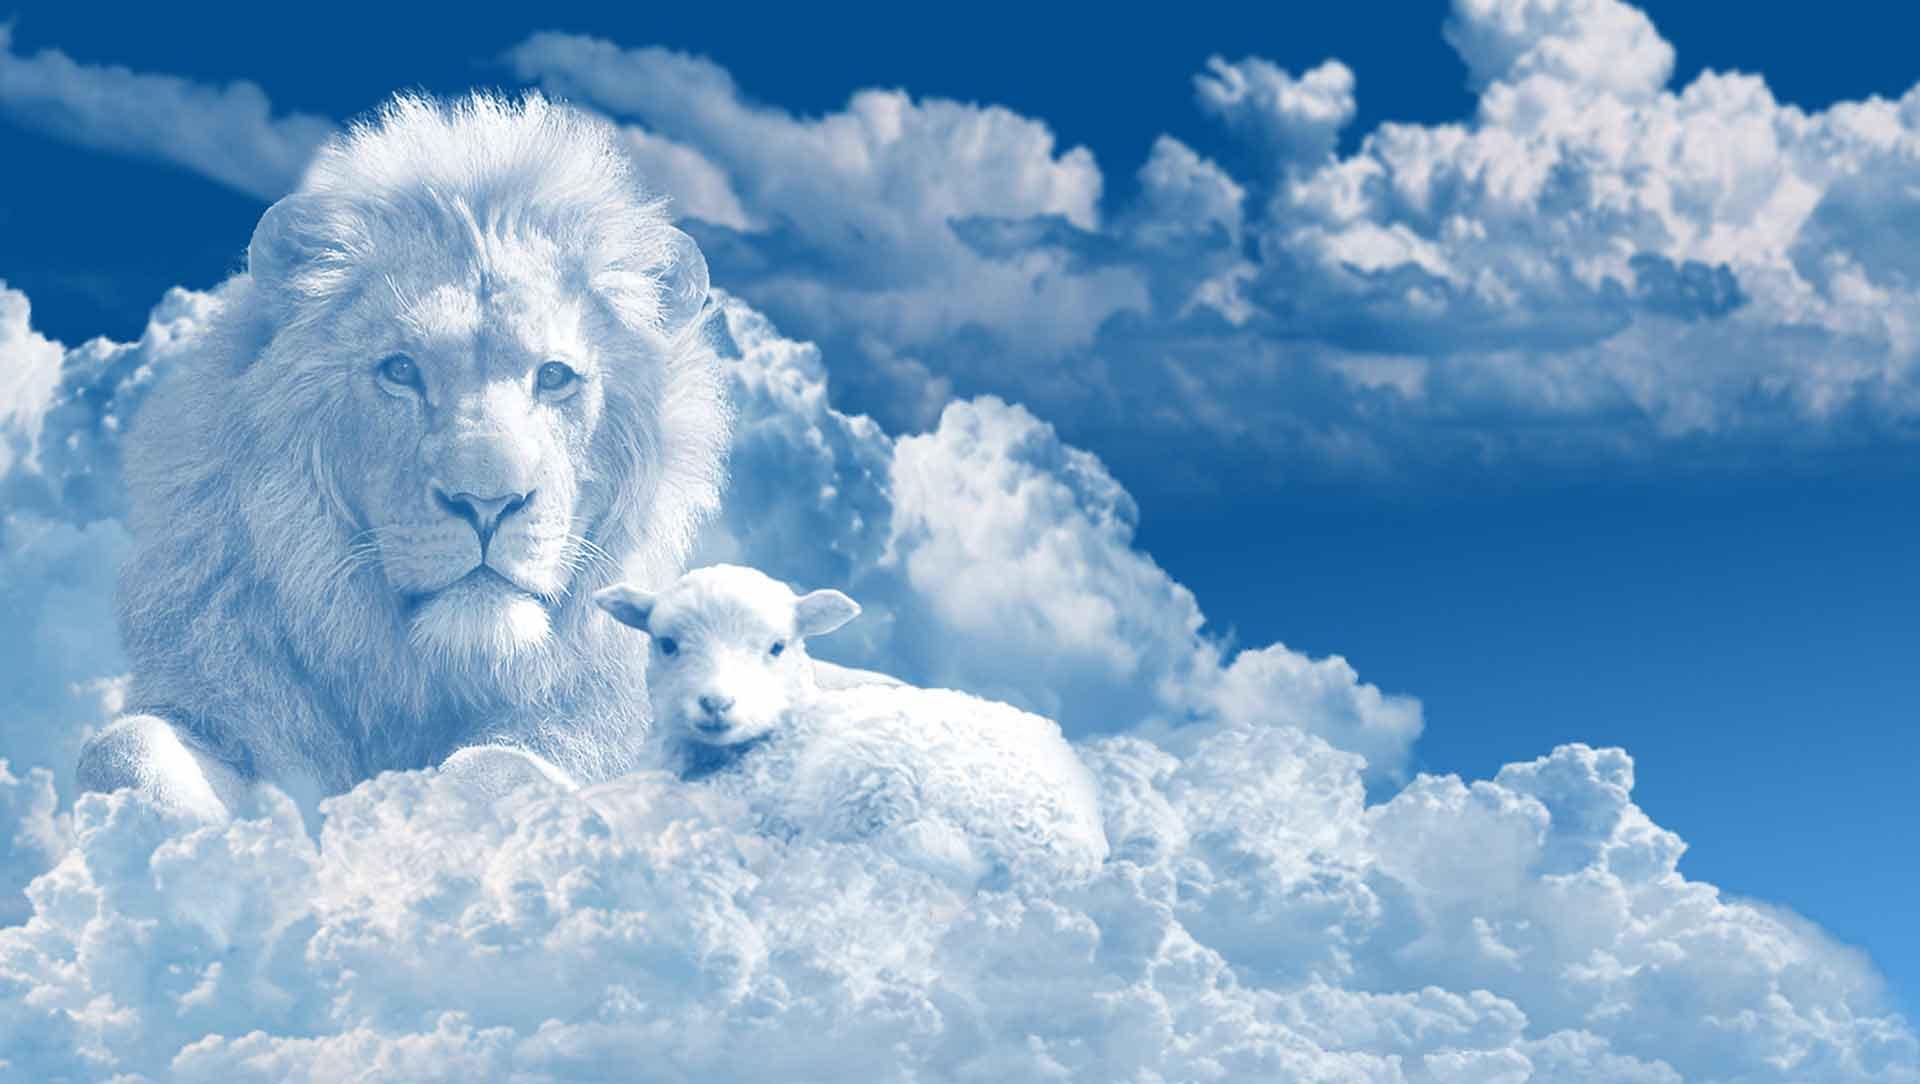 Jesus, Lion of the tribe of Judah, Lamb of God